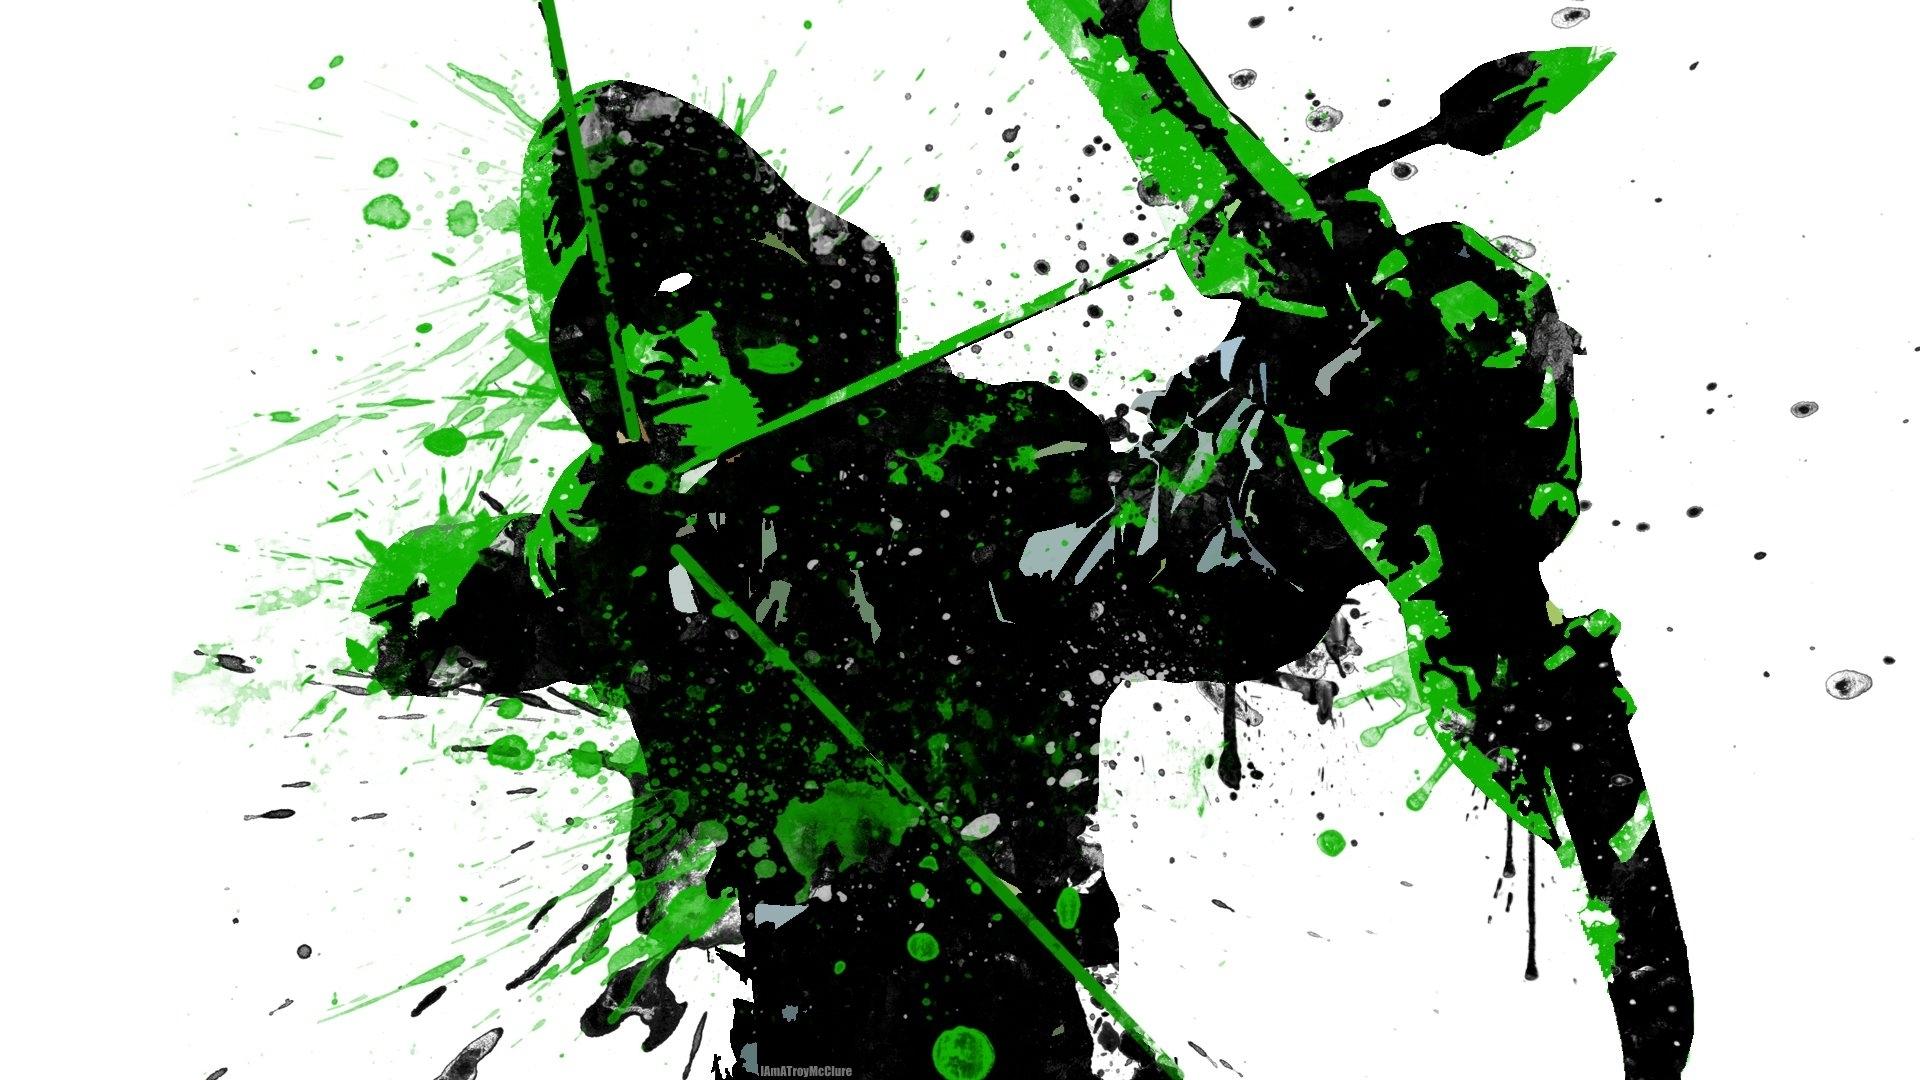 228 green arrow fonds d'écran hd | arrière-plans - wallpaper abyss